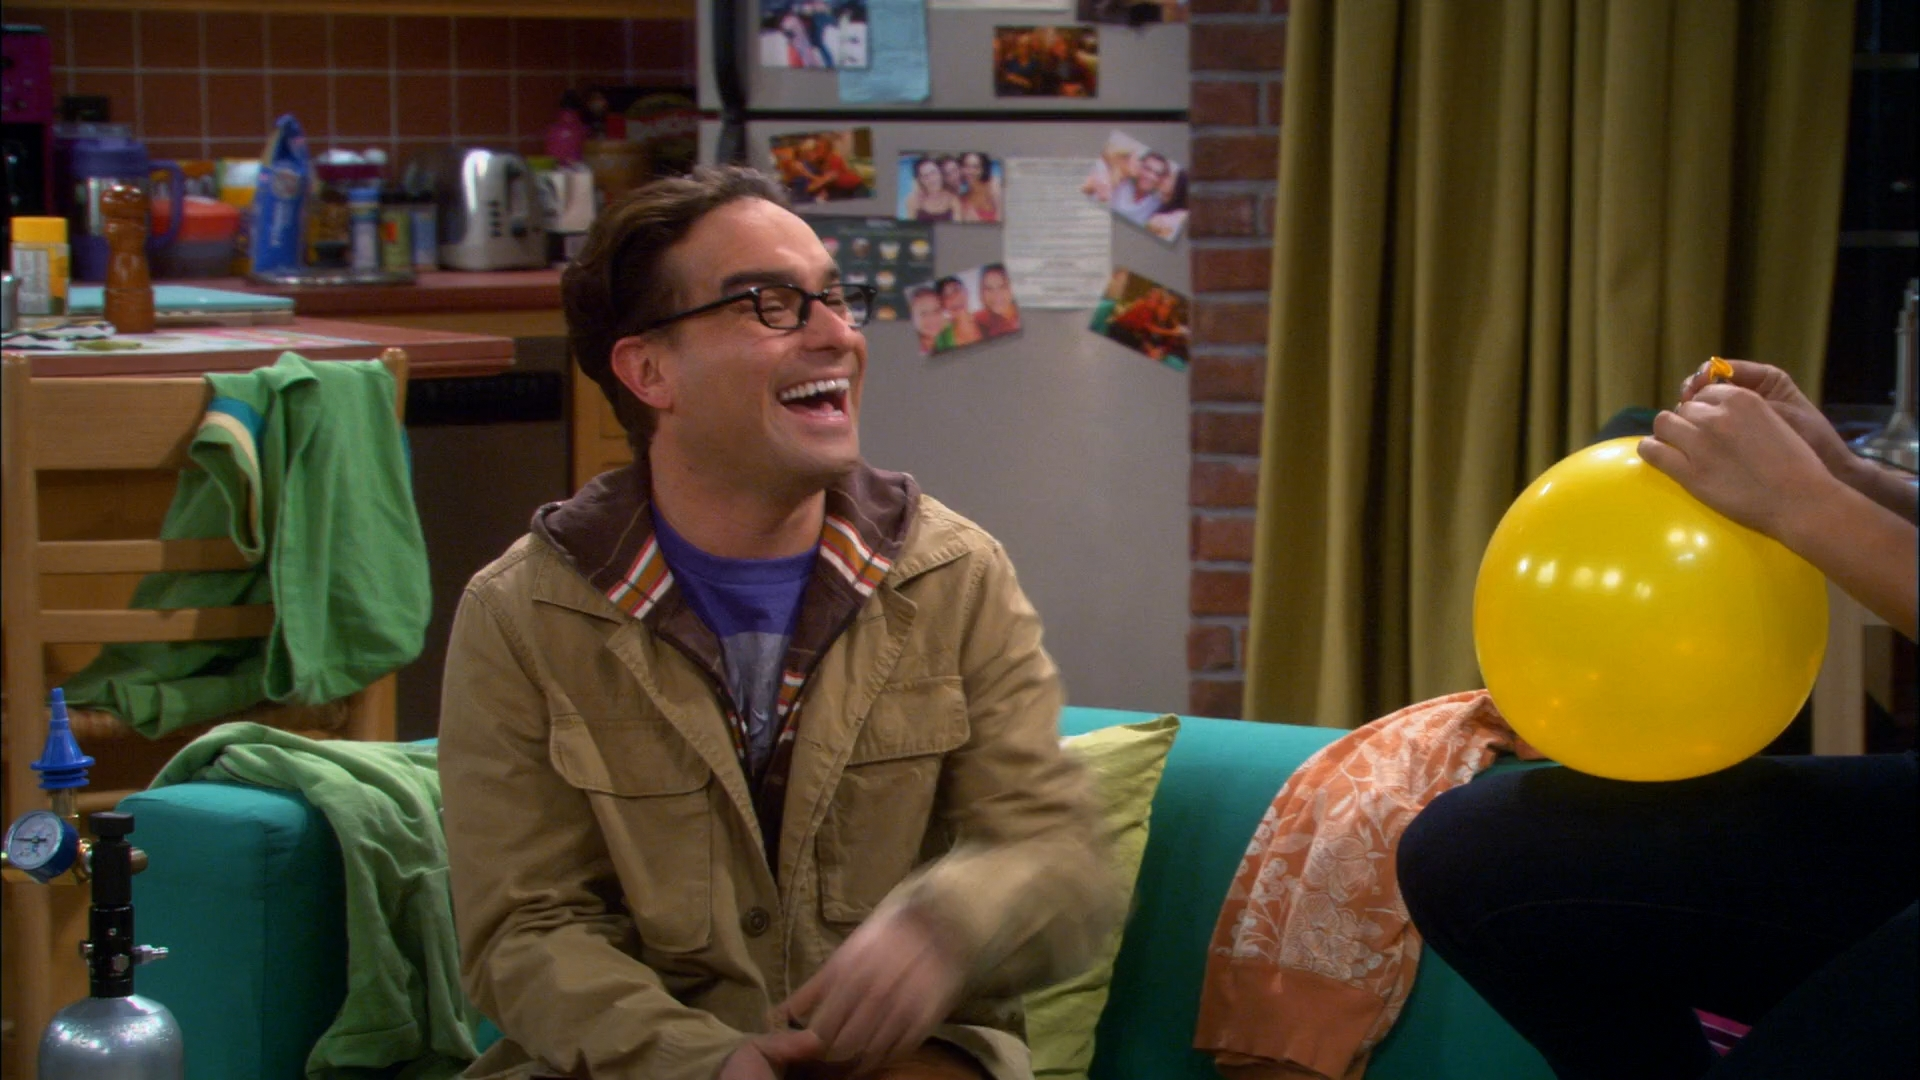 The Big Bang Theory - S05E23 - The Launch Acceleration.mkv_snapshot_04.56.jpg